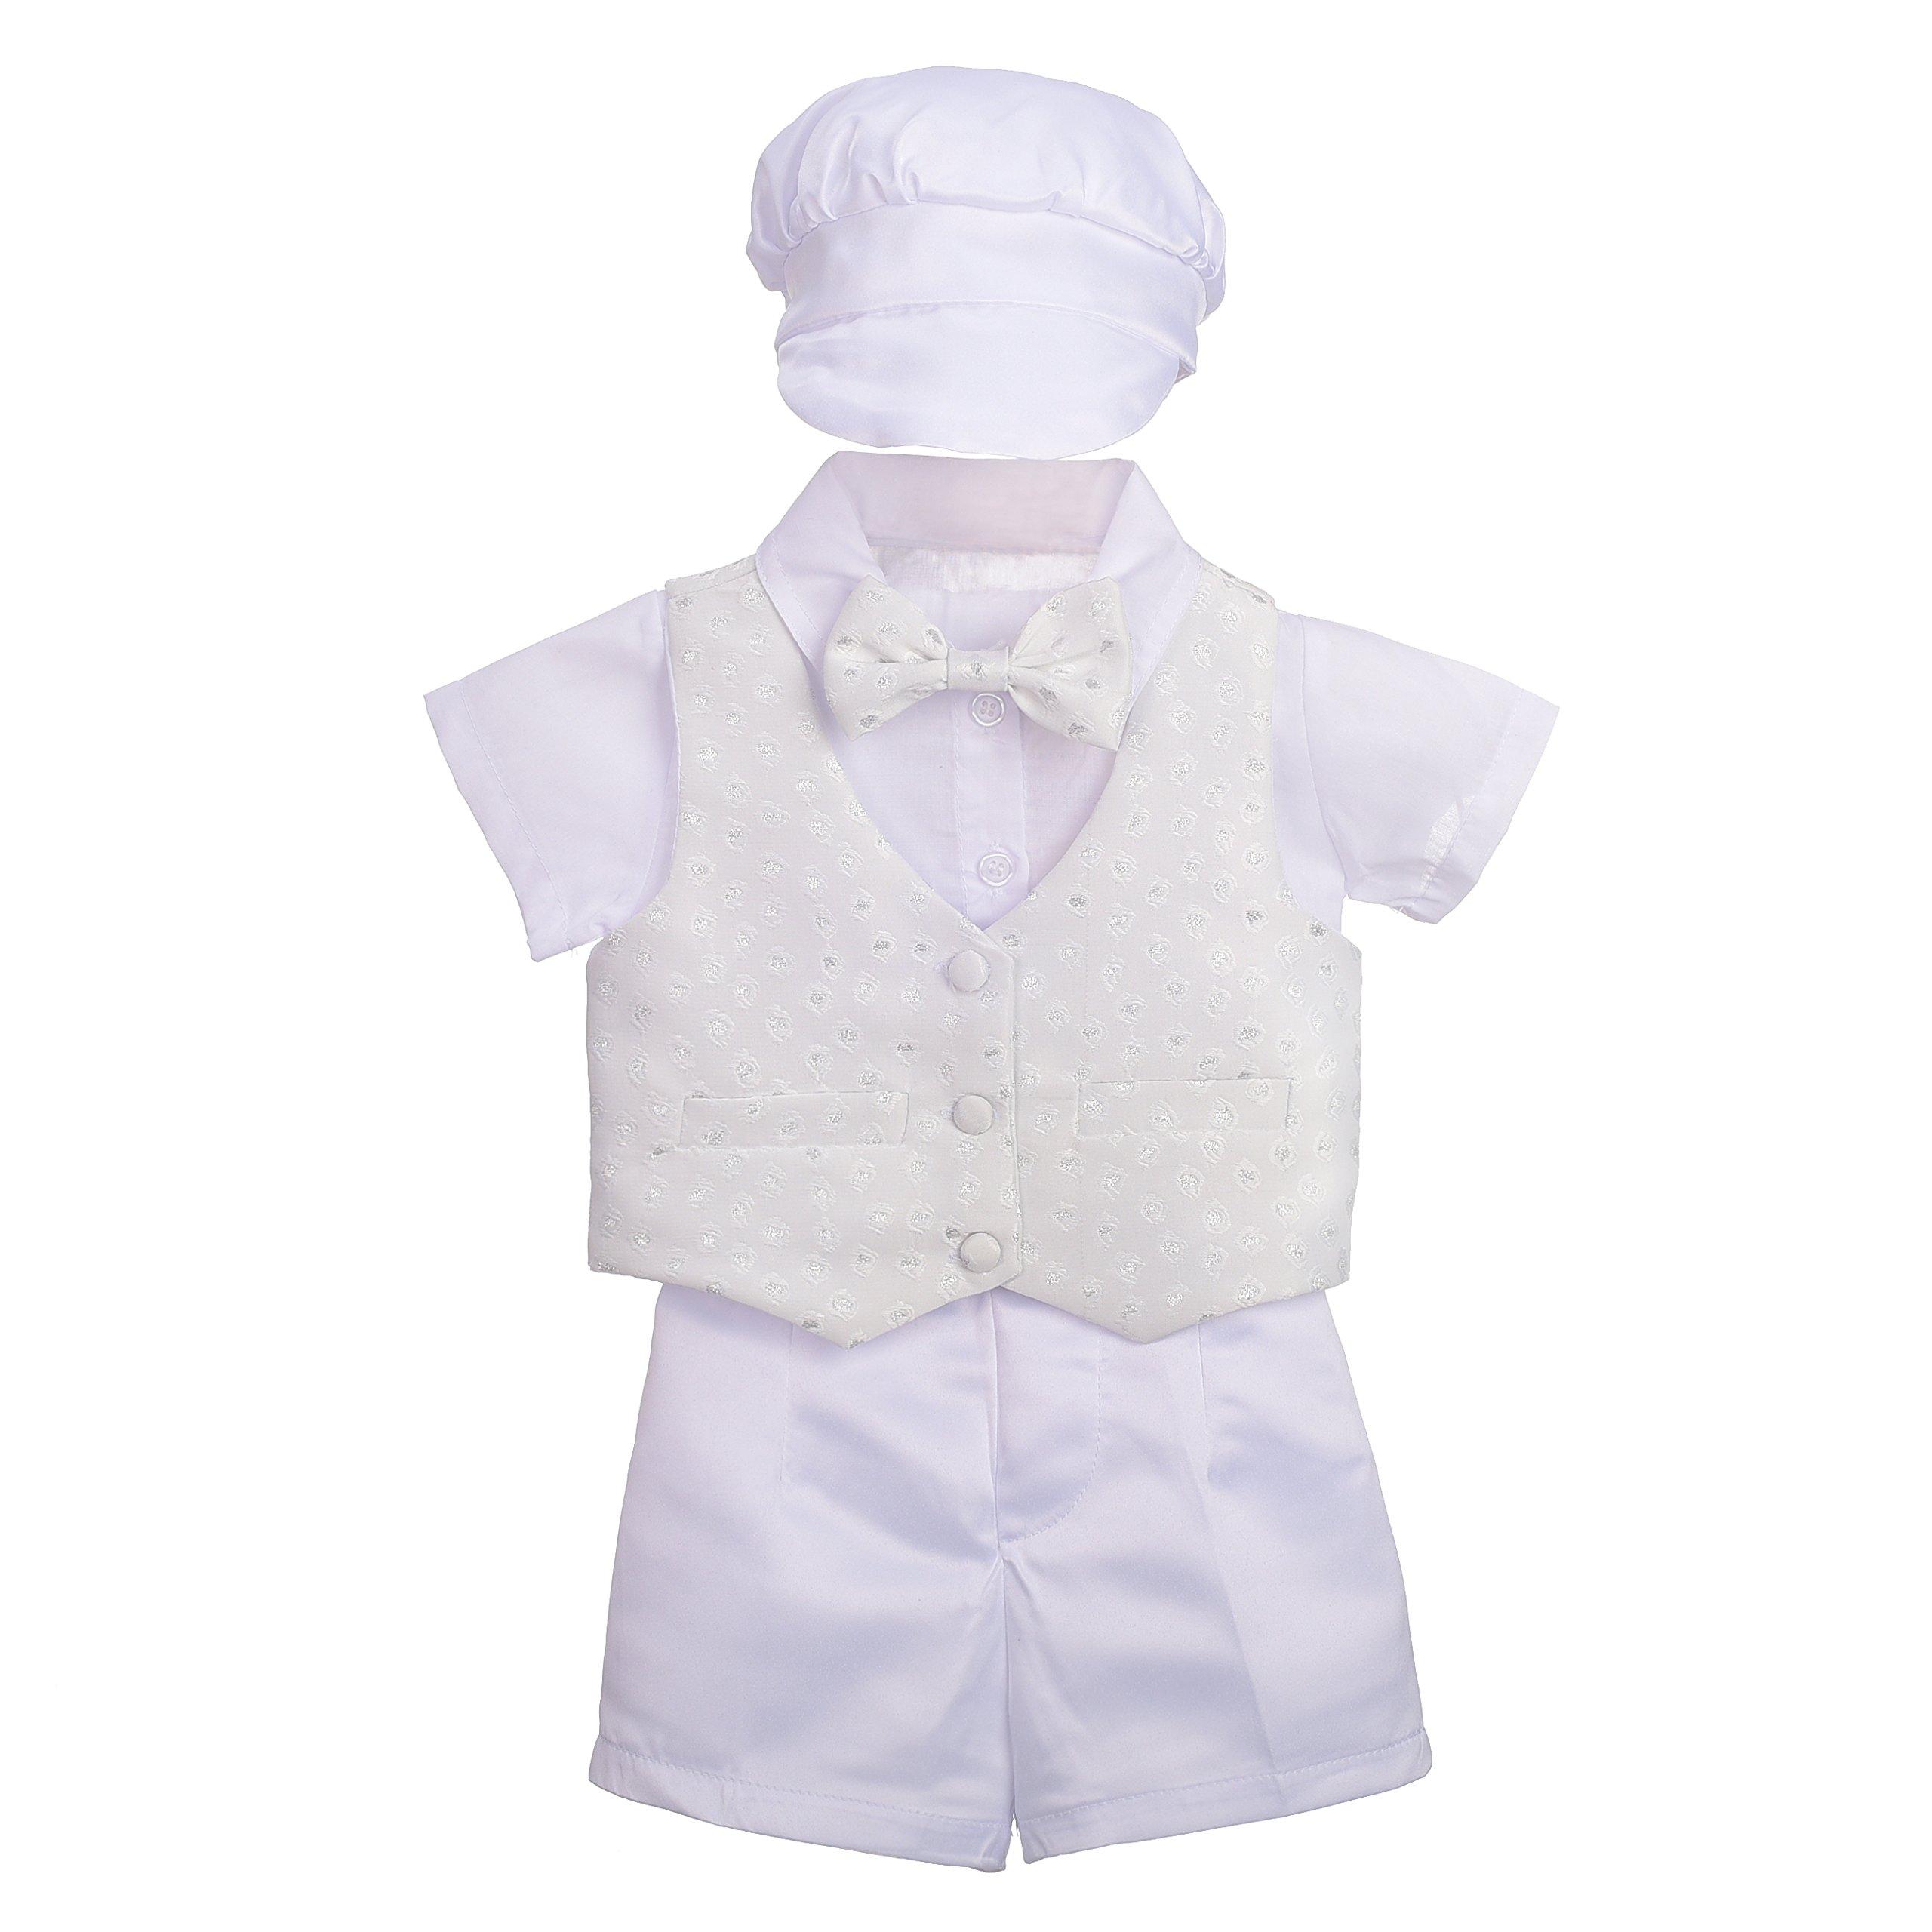 Dressy Daisy Baby Boys' 4Pcs Baptism Christening Outfit & Bonnet Wedding Suit Size 3-6 Months White